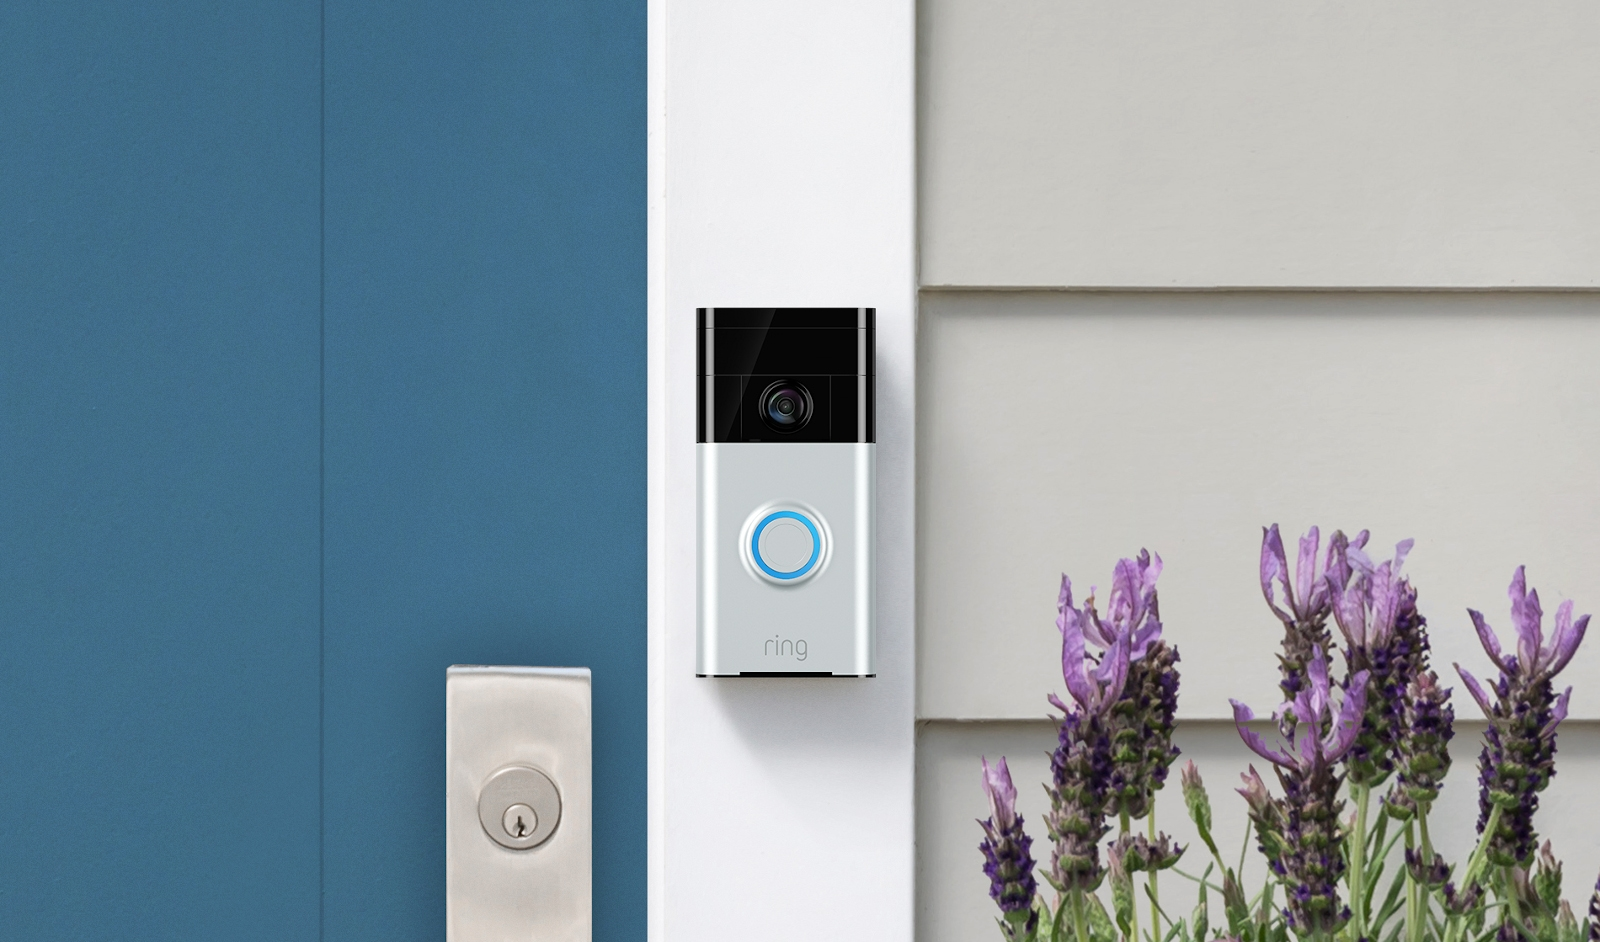 Ring recalls some second-gen video doorbells due to fire risk | DeviceDaily.com